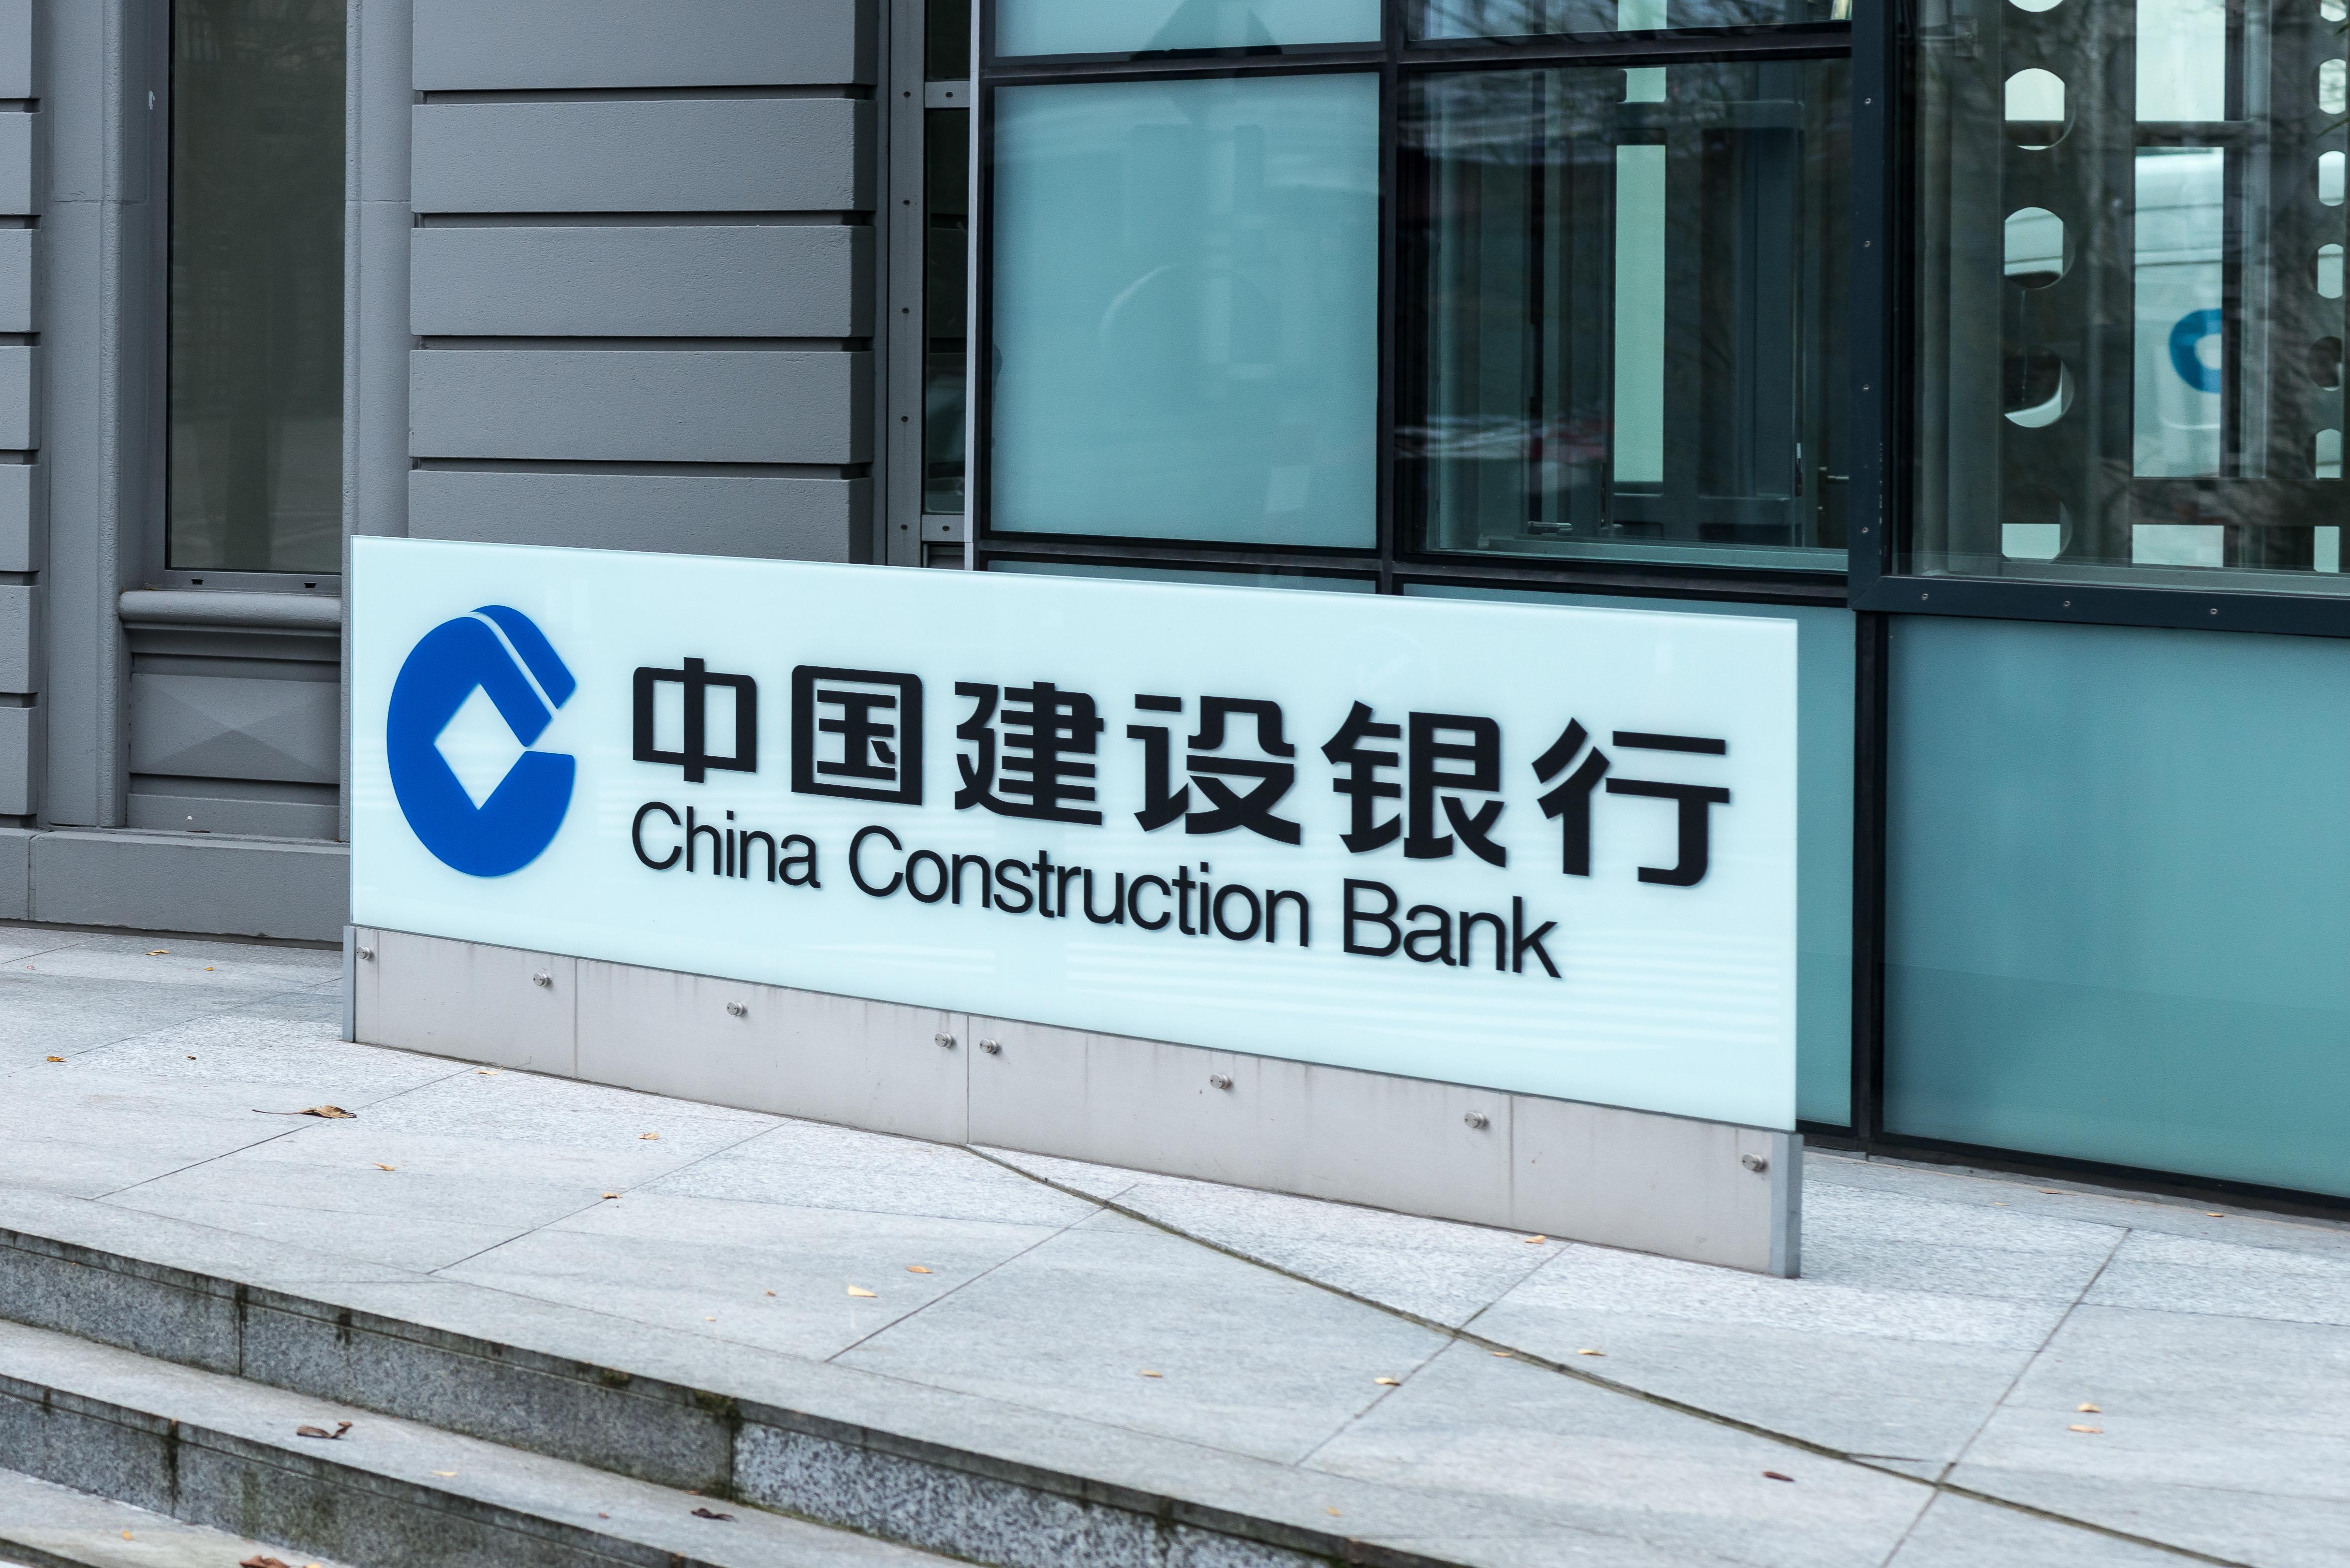 China_Construction_Bank%2C_European_headquarters%2C_1%2C_bd_Royal-101.jpg